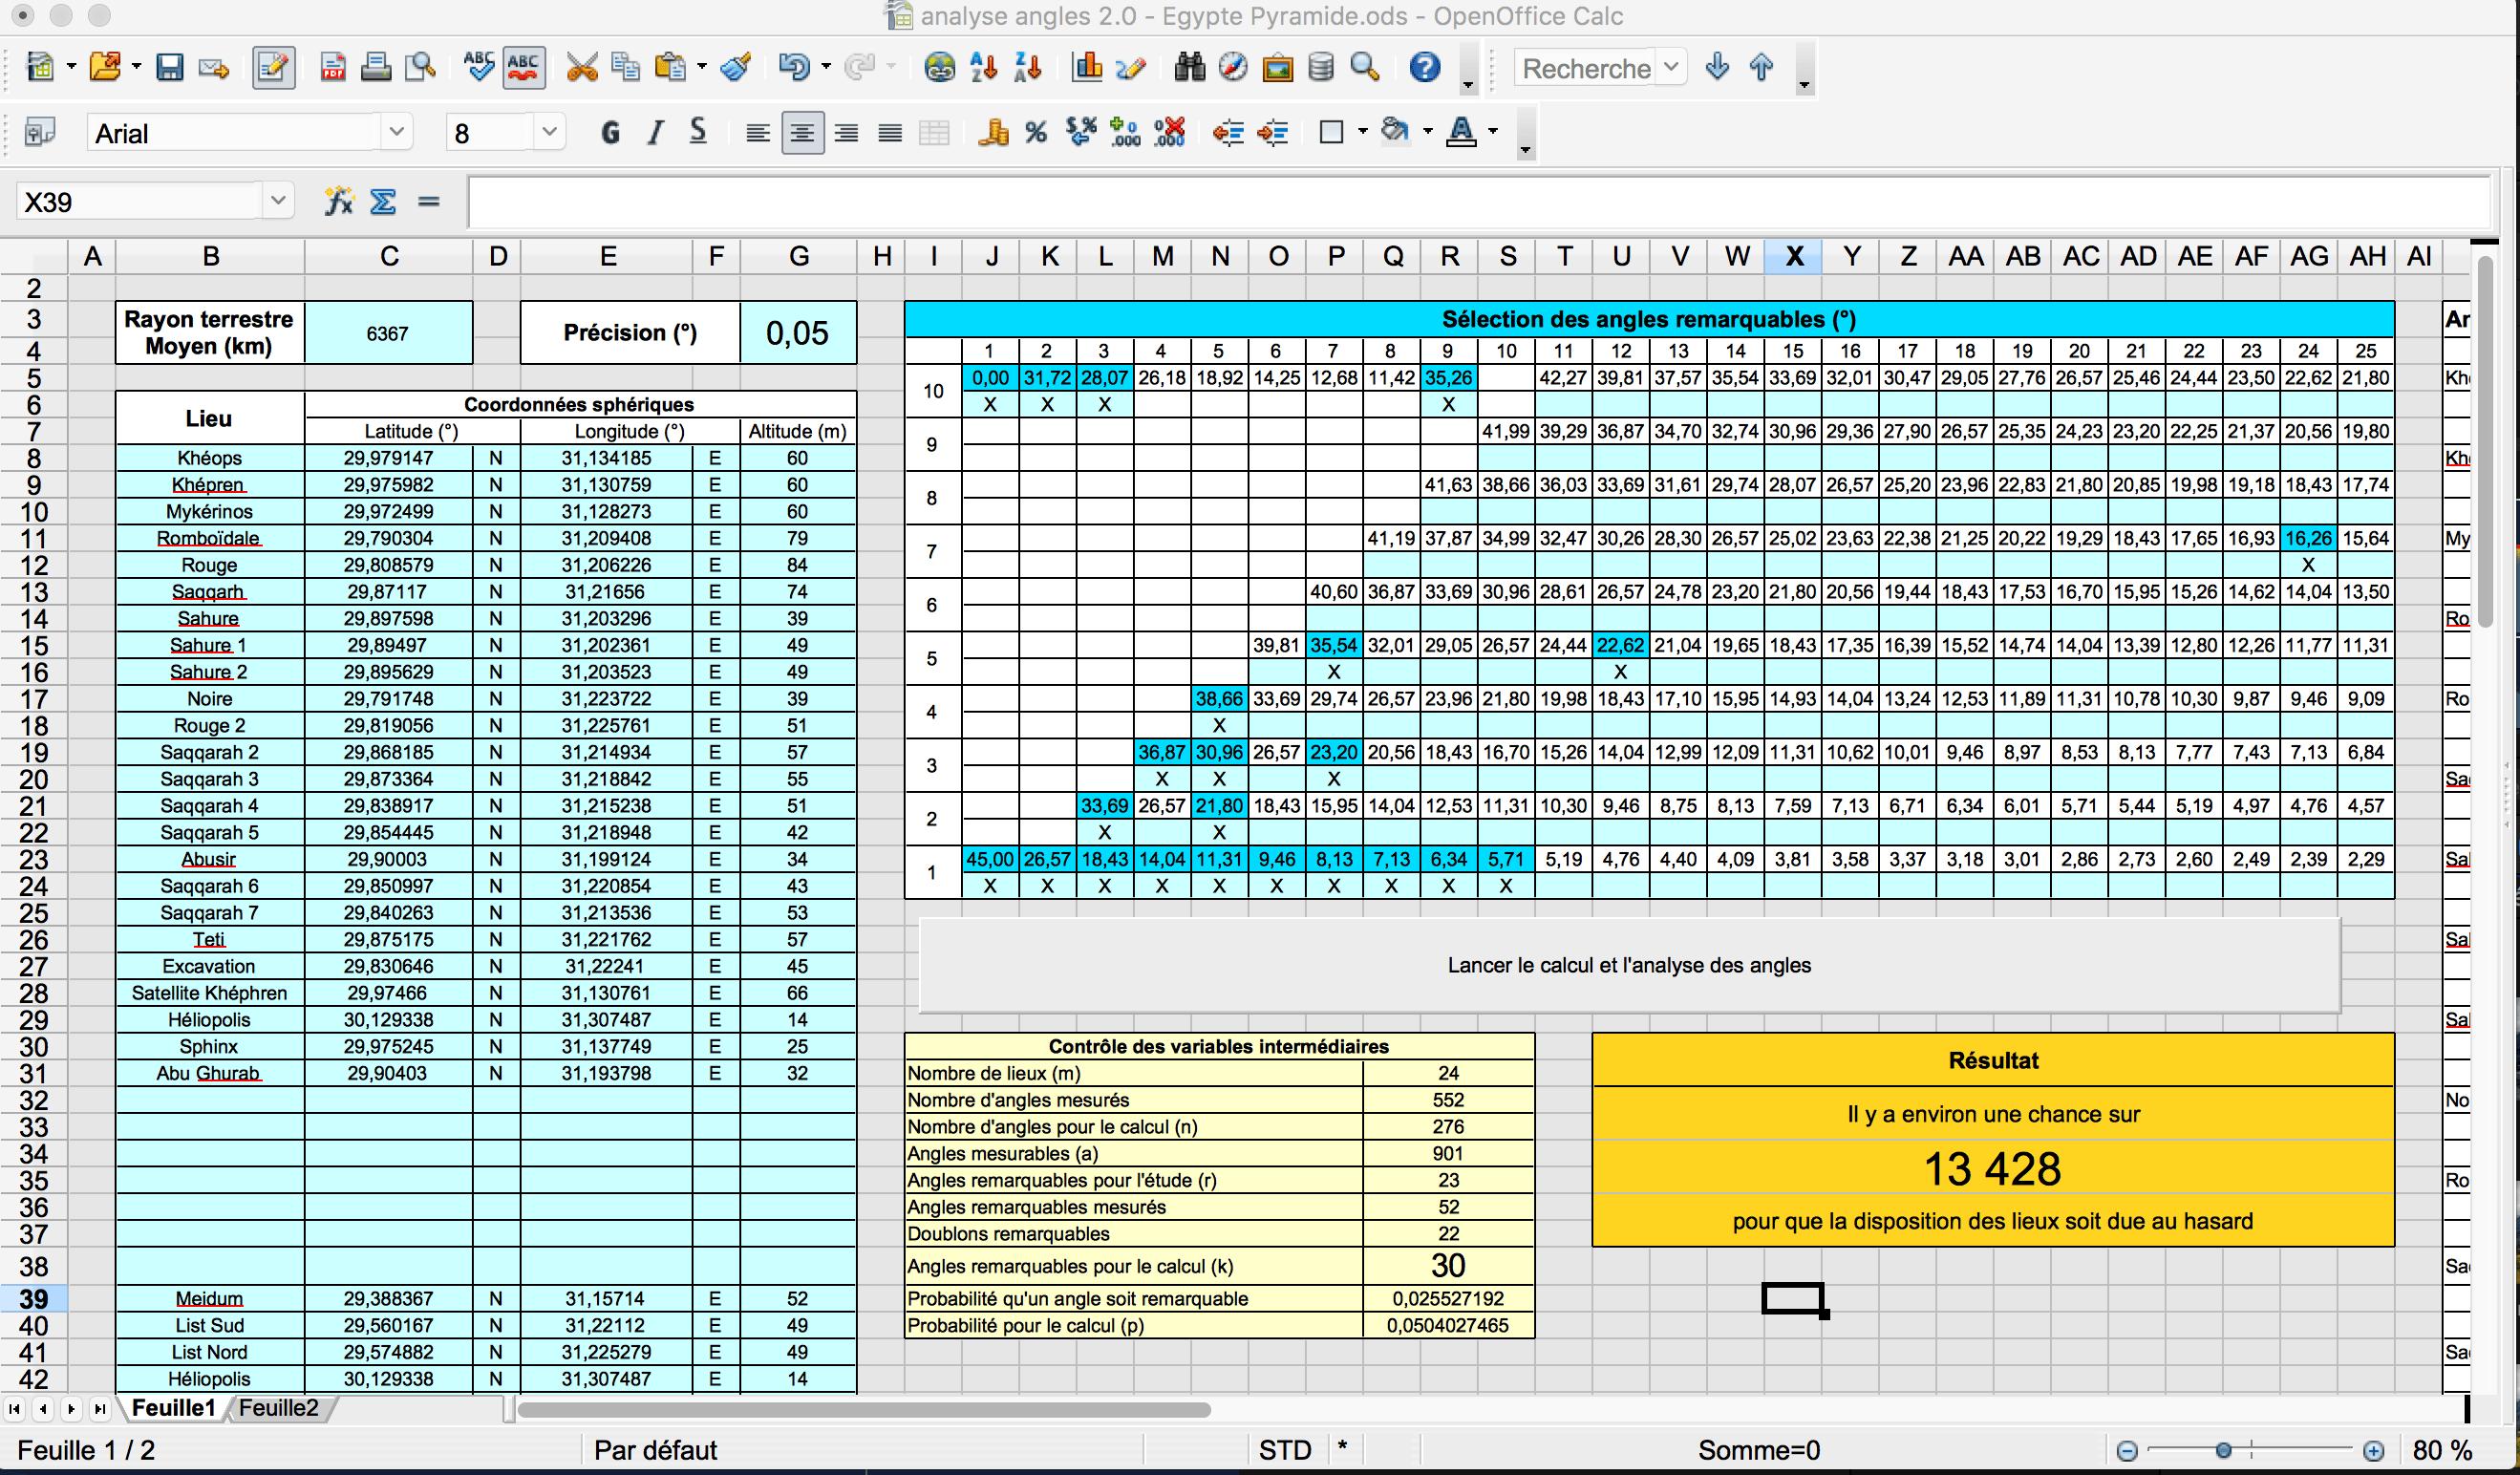 2017-11-13 20:52:53